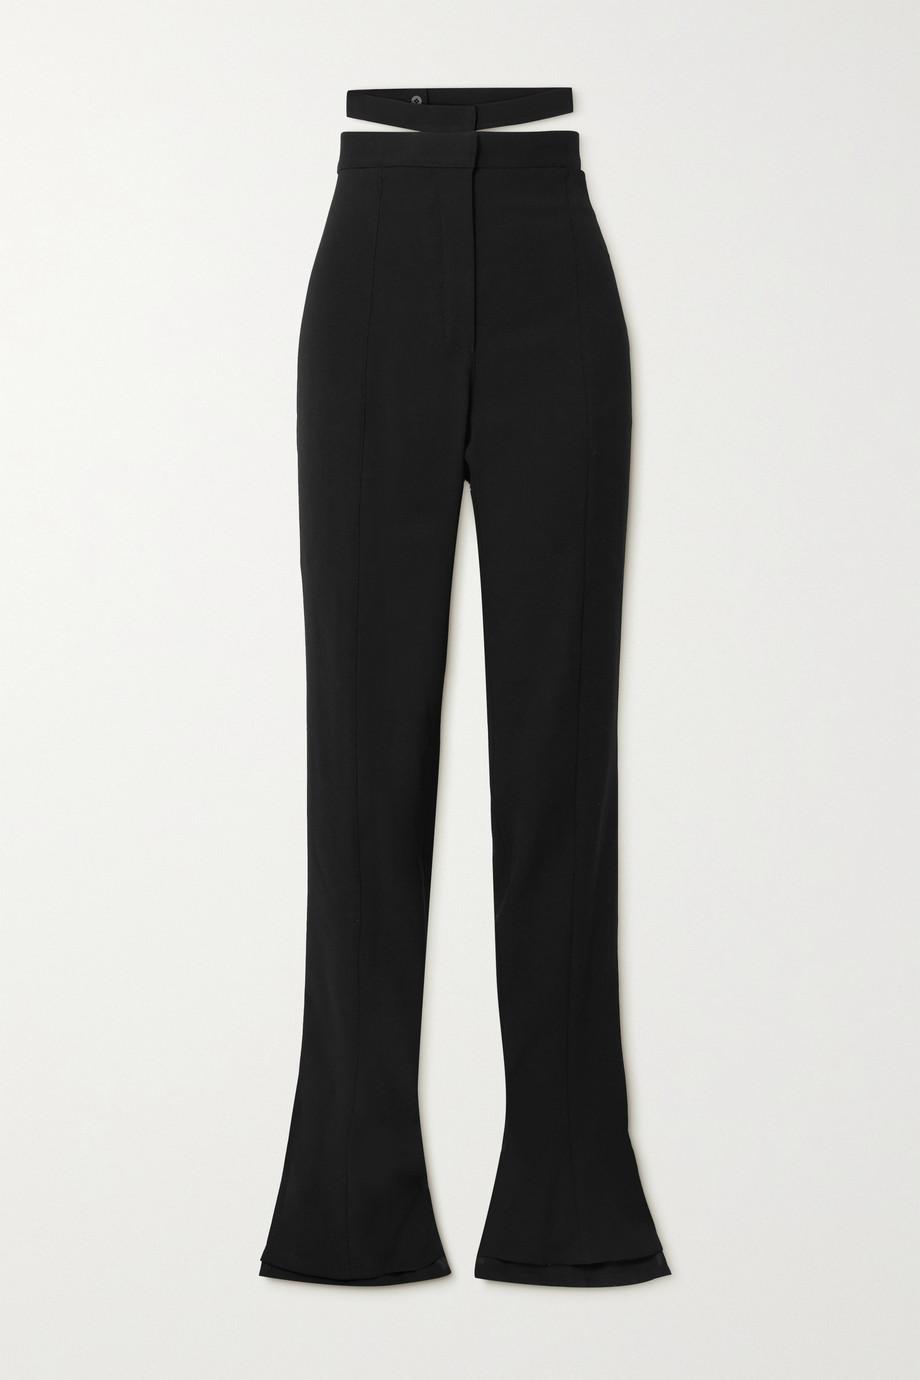 Mugler Cutout wool-twill flared pants